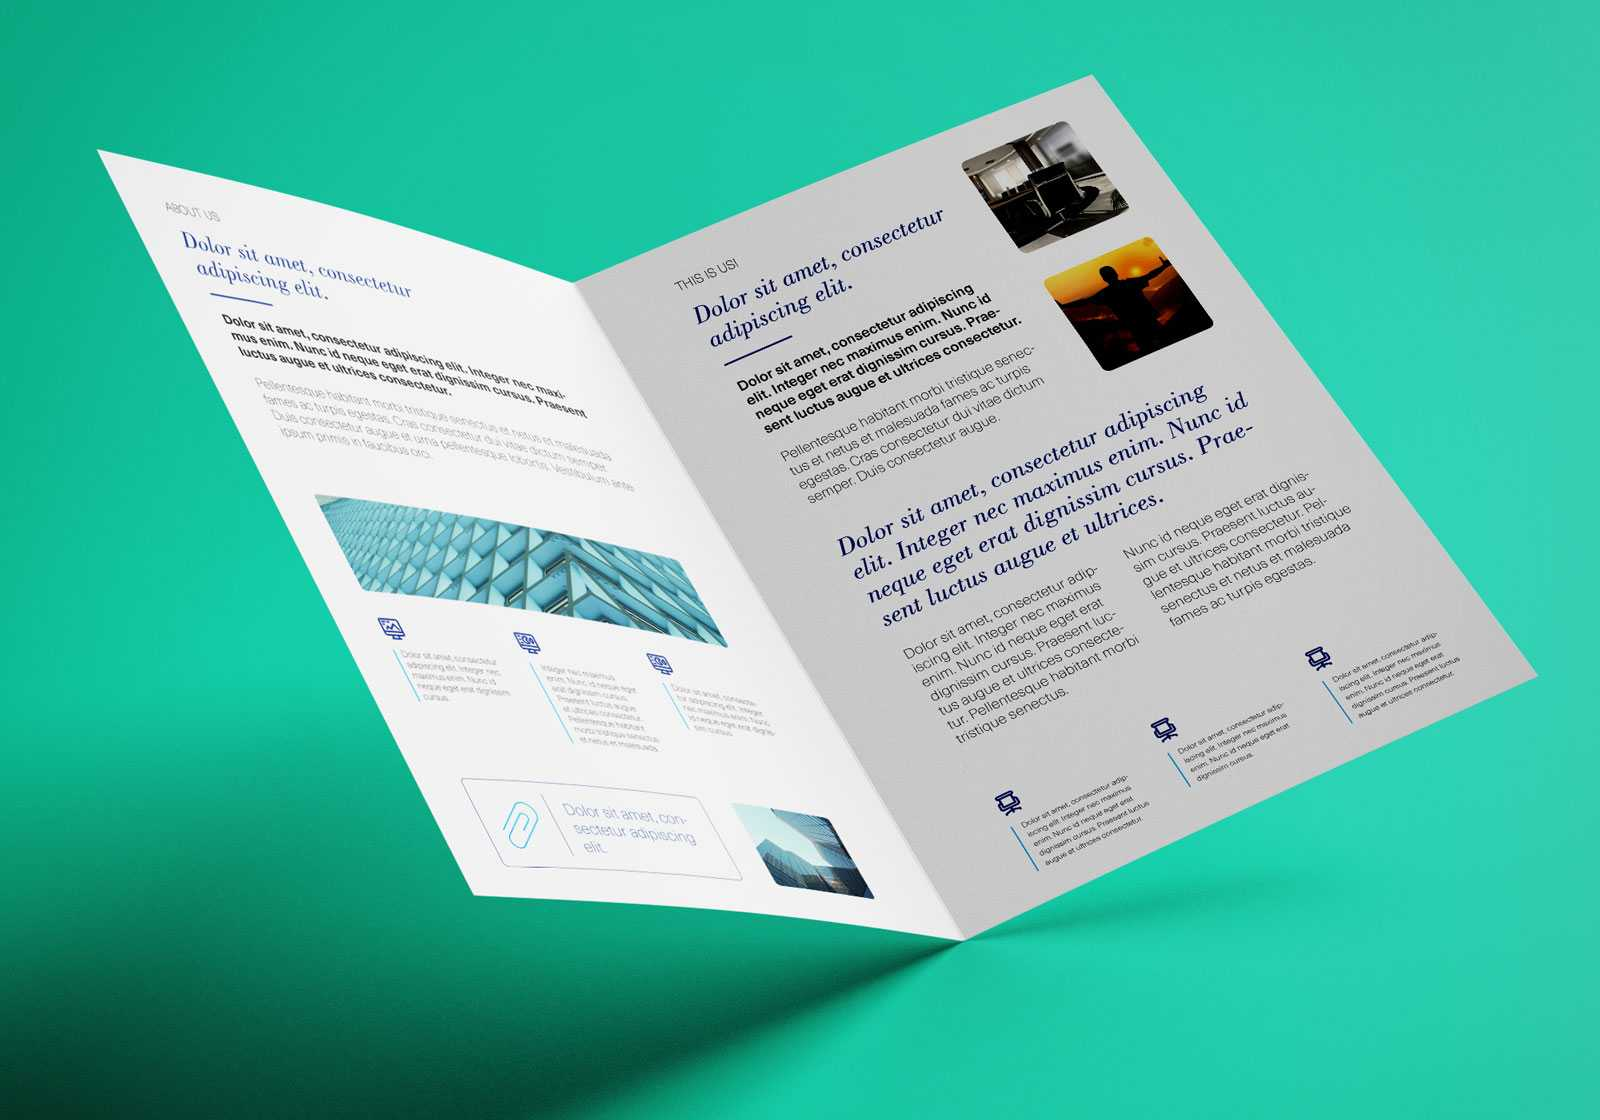 Free Bi Fold A4 Brochure Mockup Psd – Good Mockups With Regard To 2 Fold Brochure Template Psd